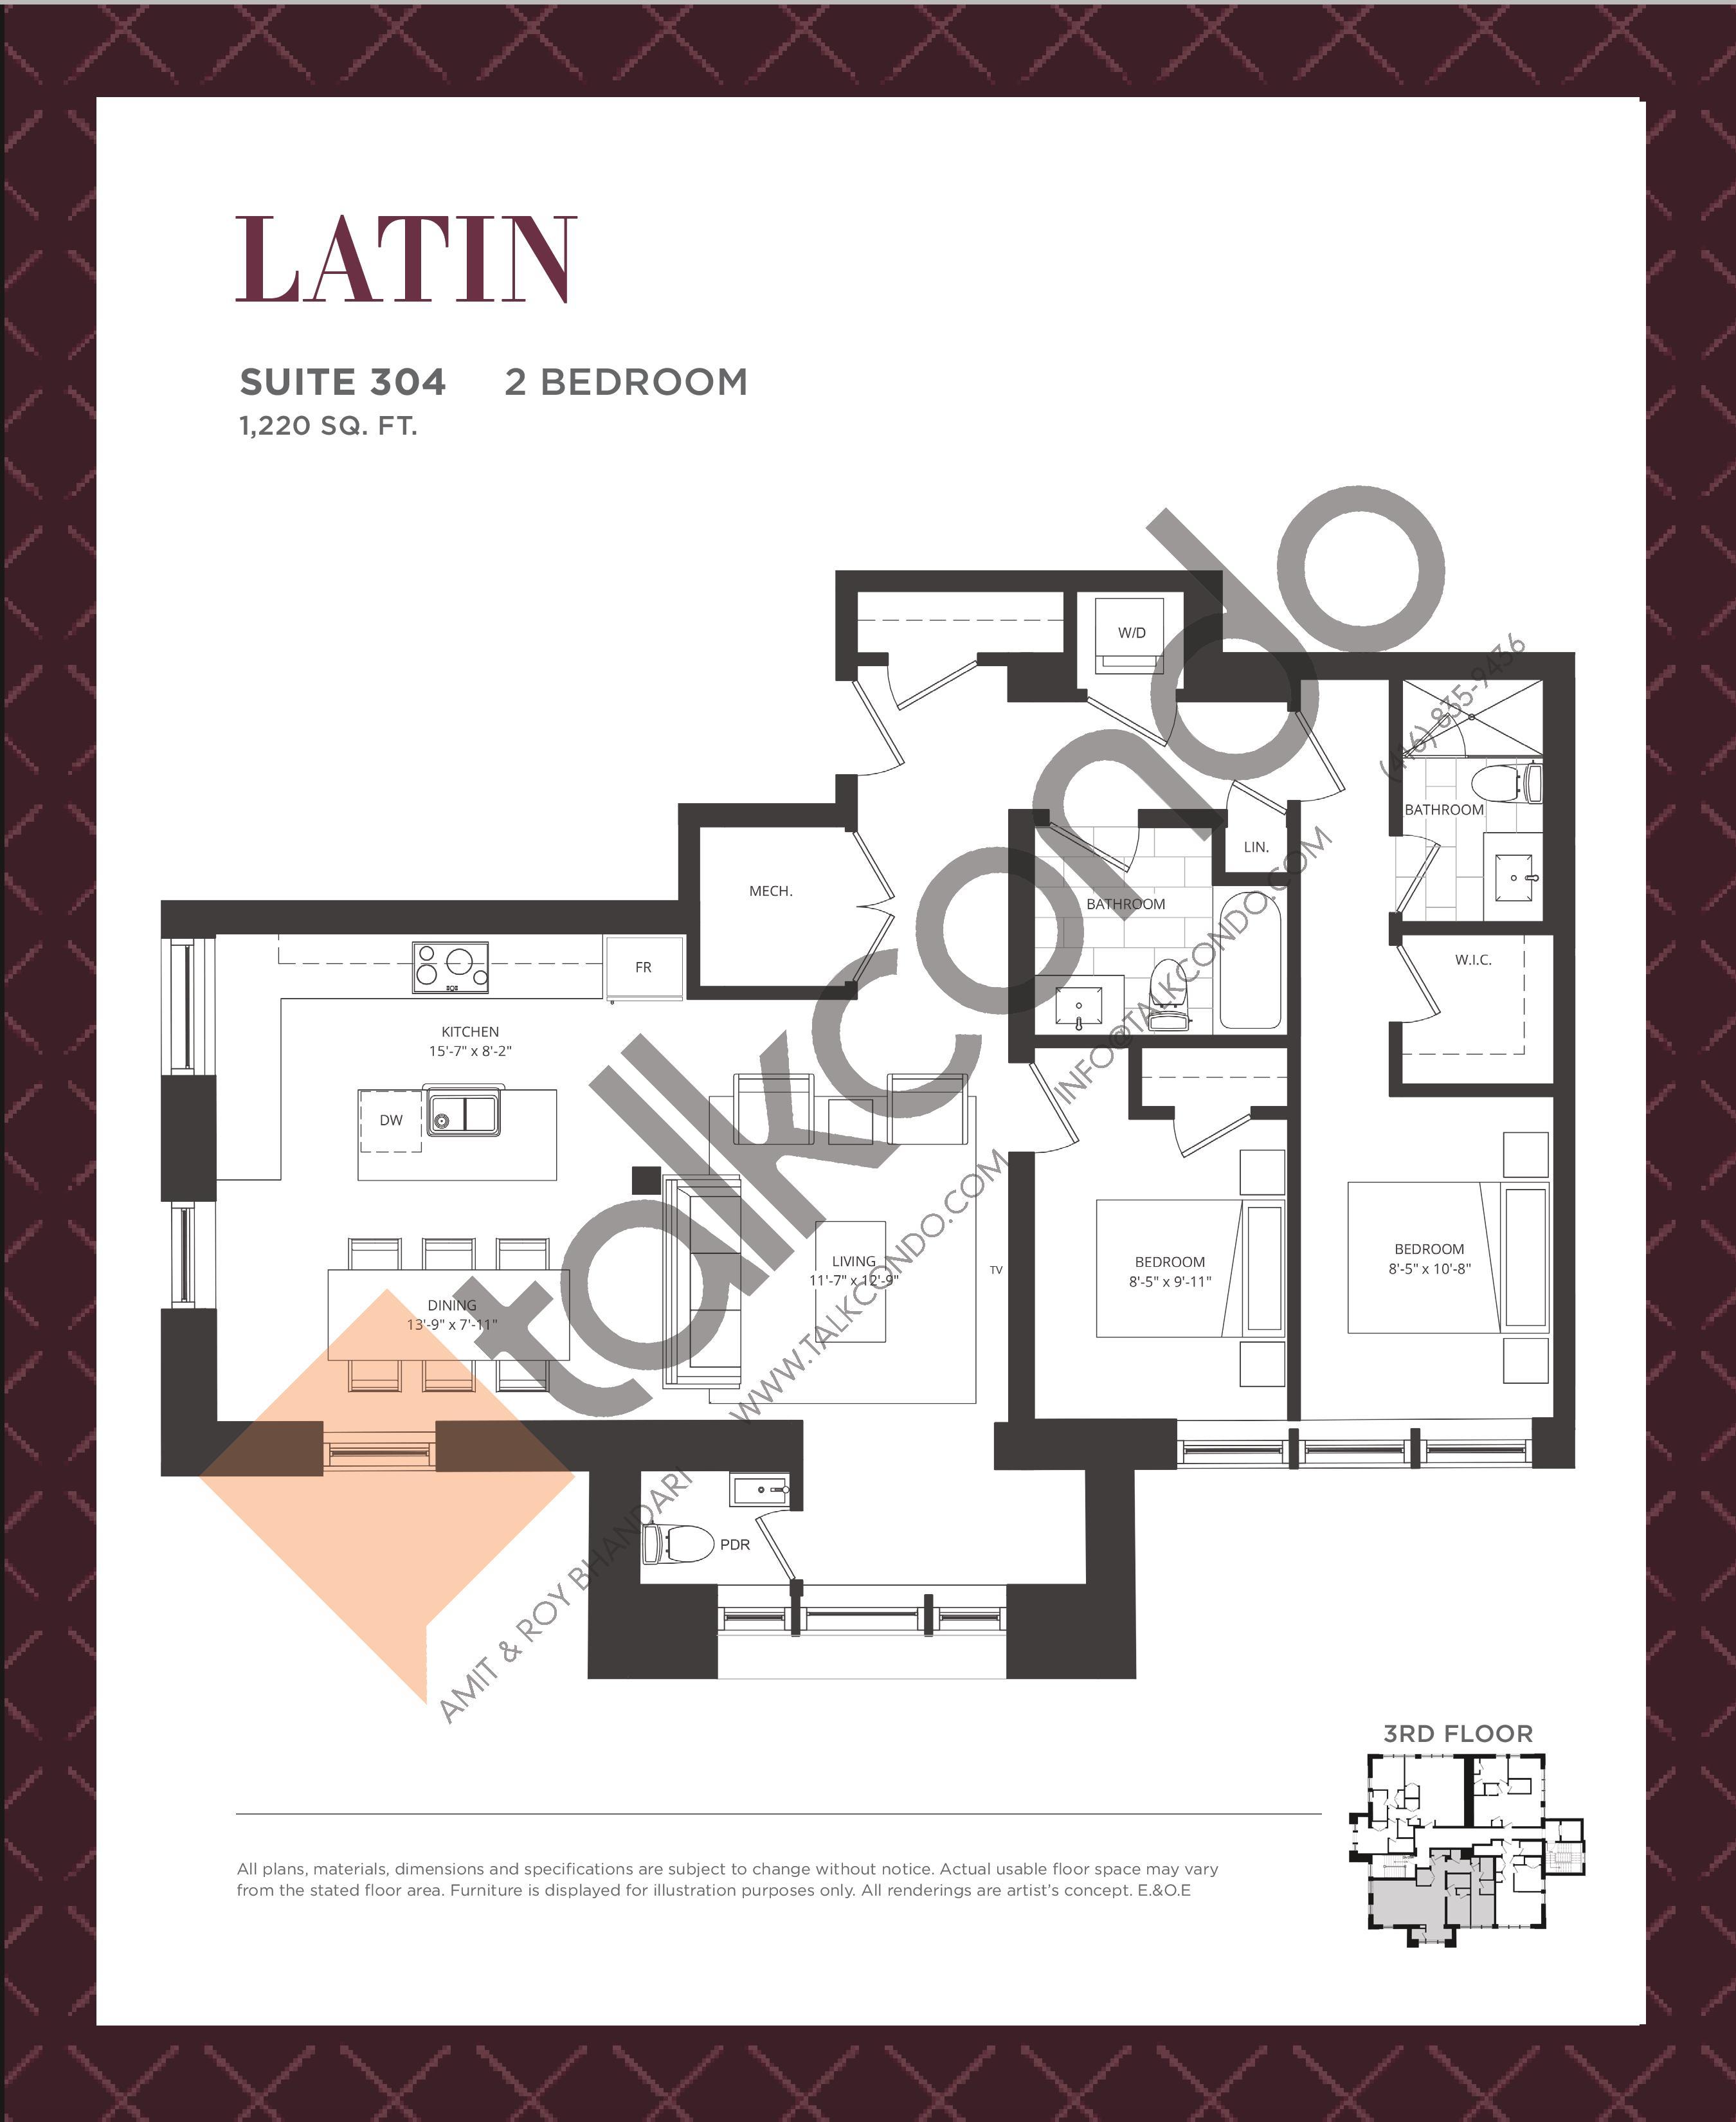 Latin Floor Plan at King George School Lofts & Town Homes - 1220 sq.ft